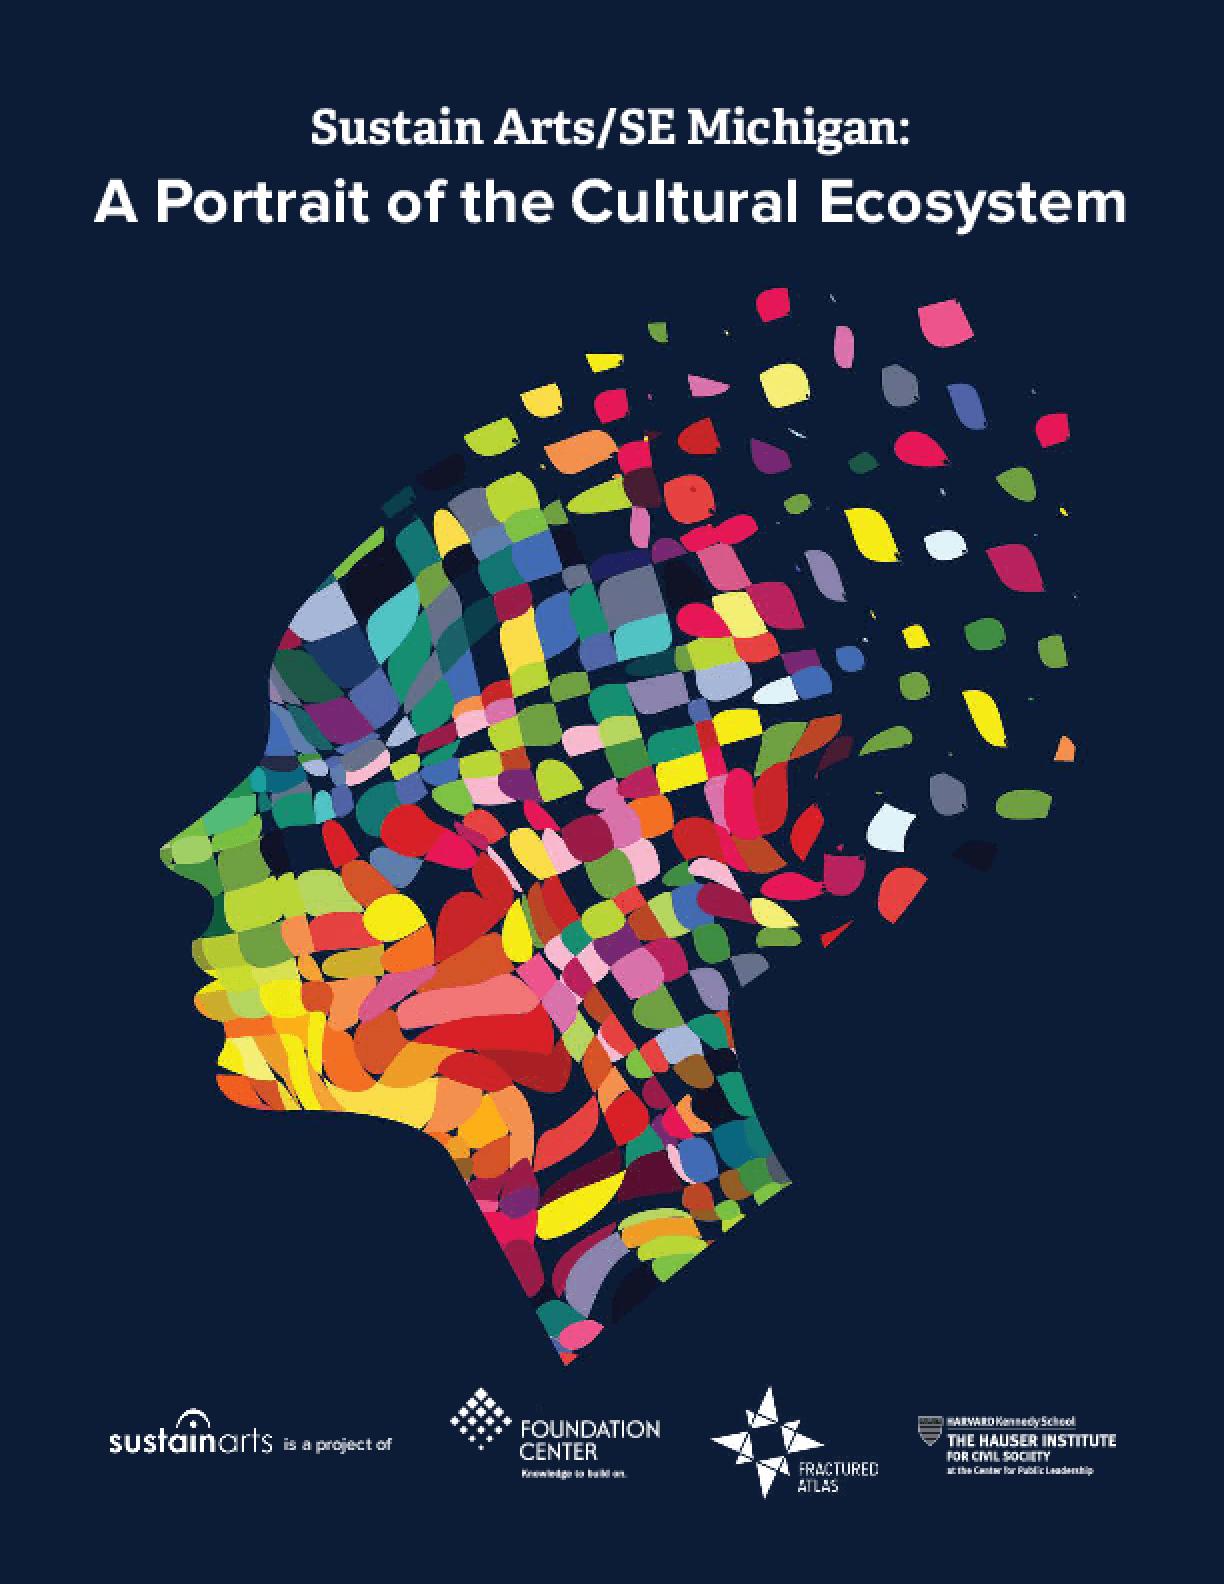 Sustain Arts/SE Michigan: A Portrait of the Cultural Ecosystem